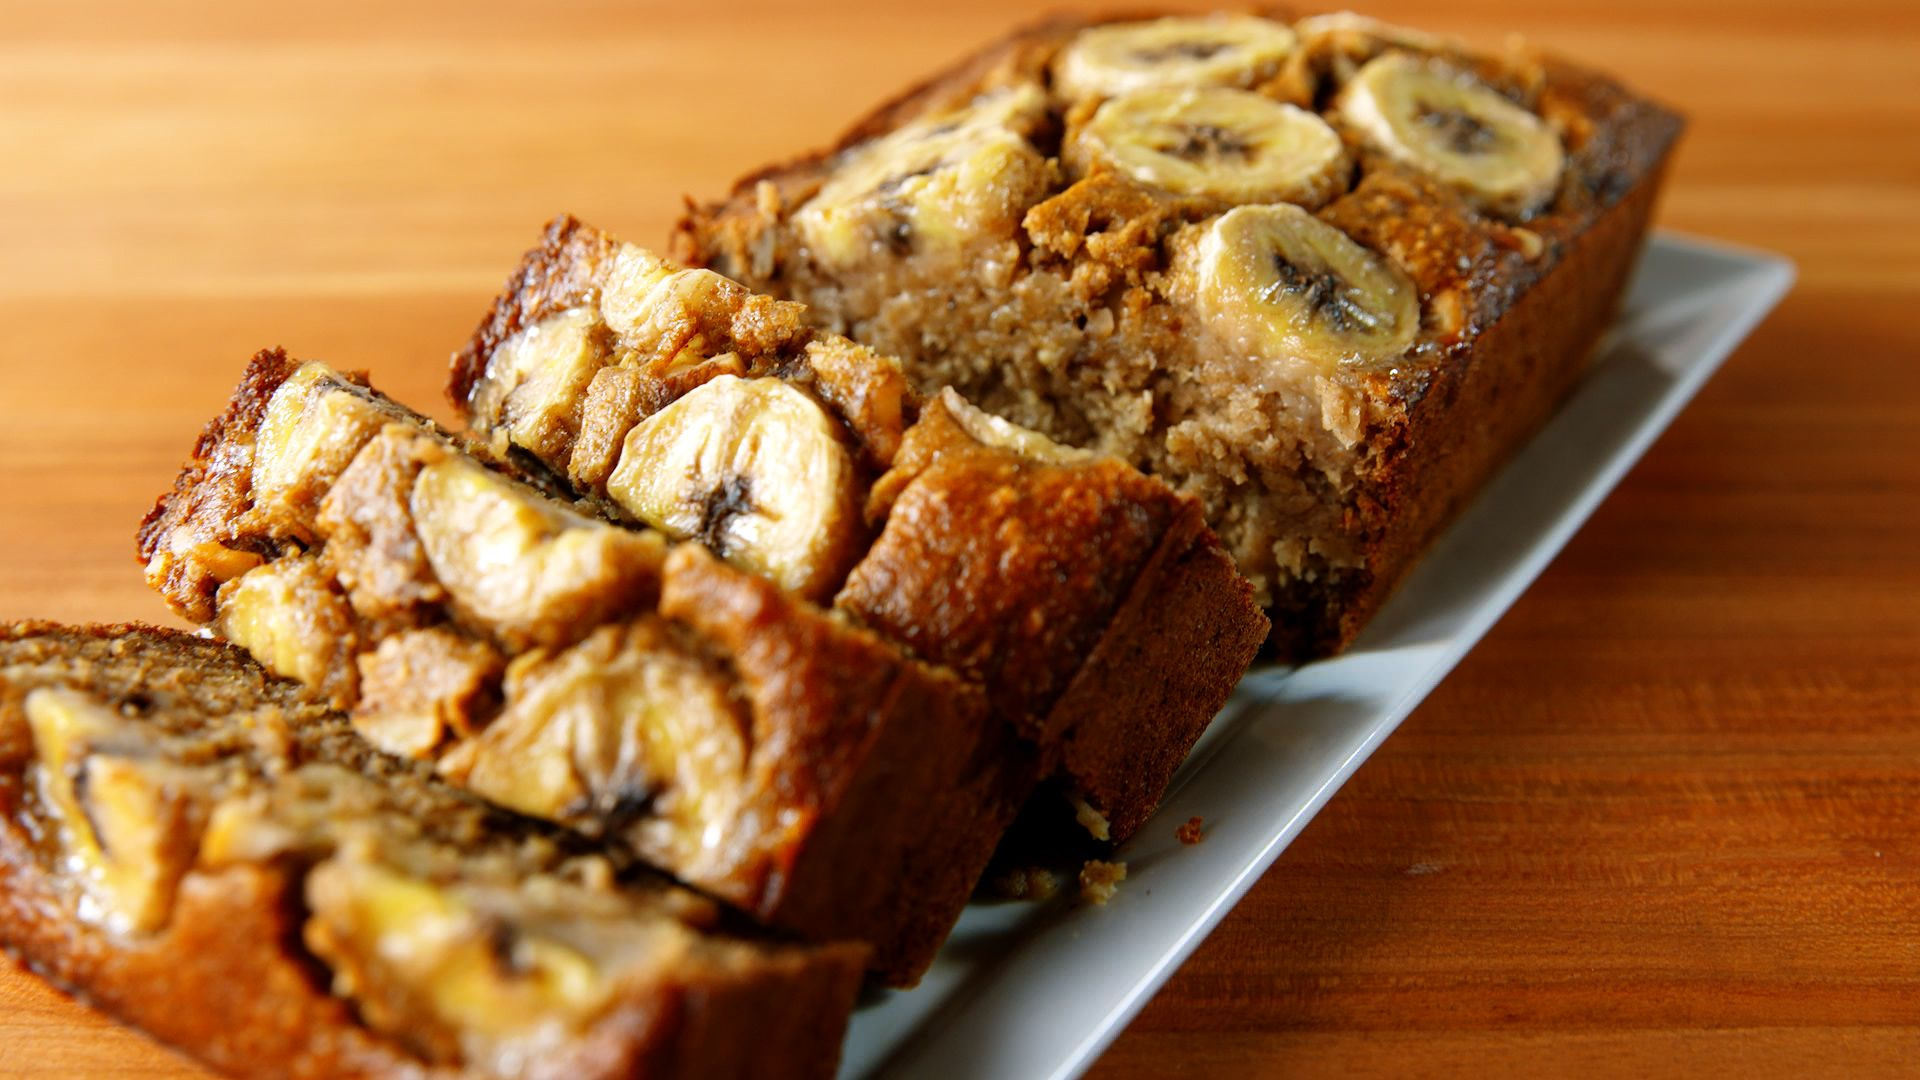 Best Gluten Free Banana Bread Recipe How To Make Gluten Free Banana Bread